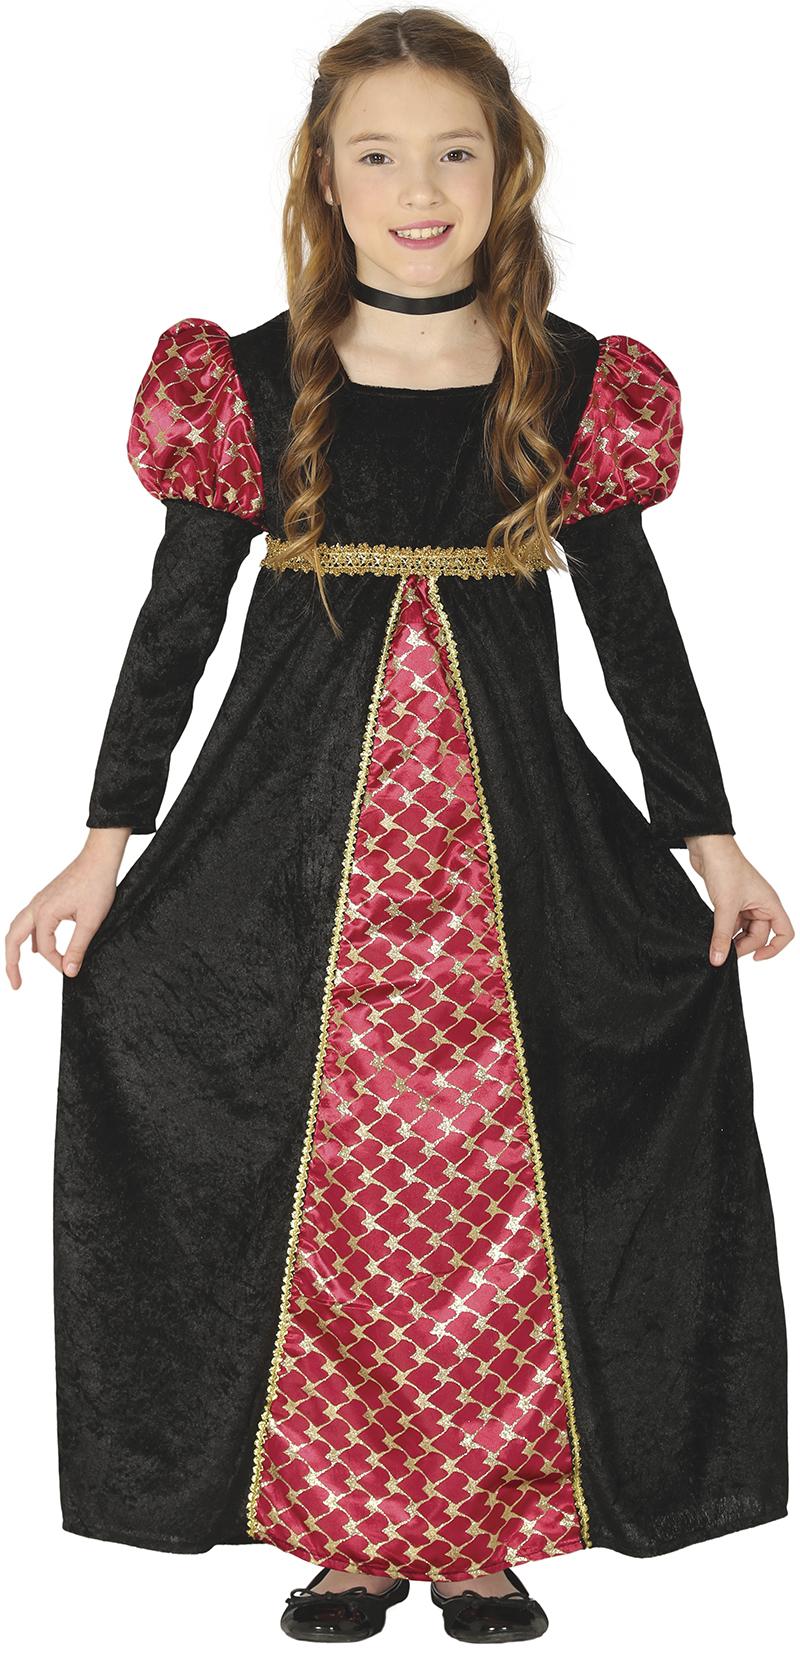 Guirca Kostým Princezny Velikost: 7 - 9 let ( výška 127 - 132 cm )